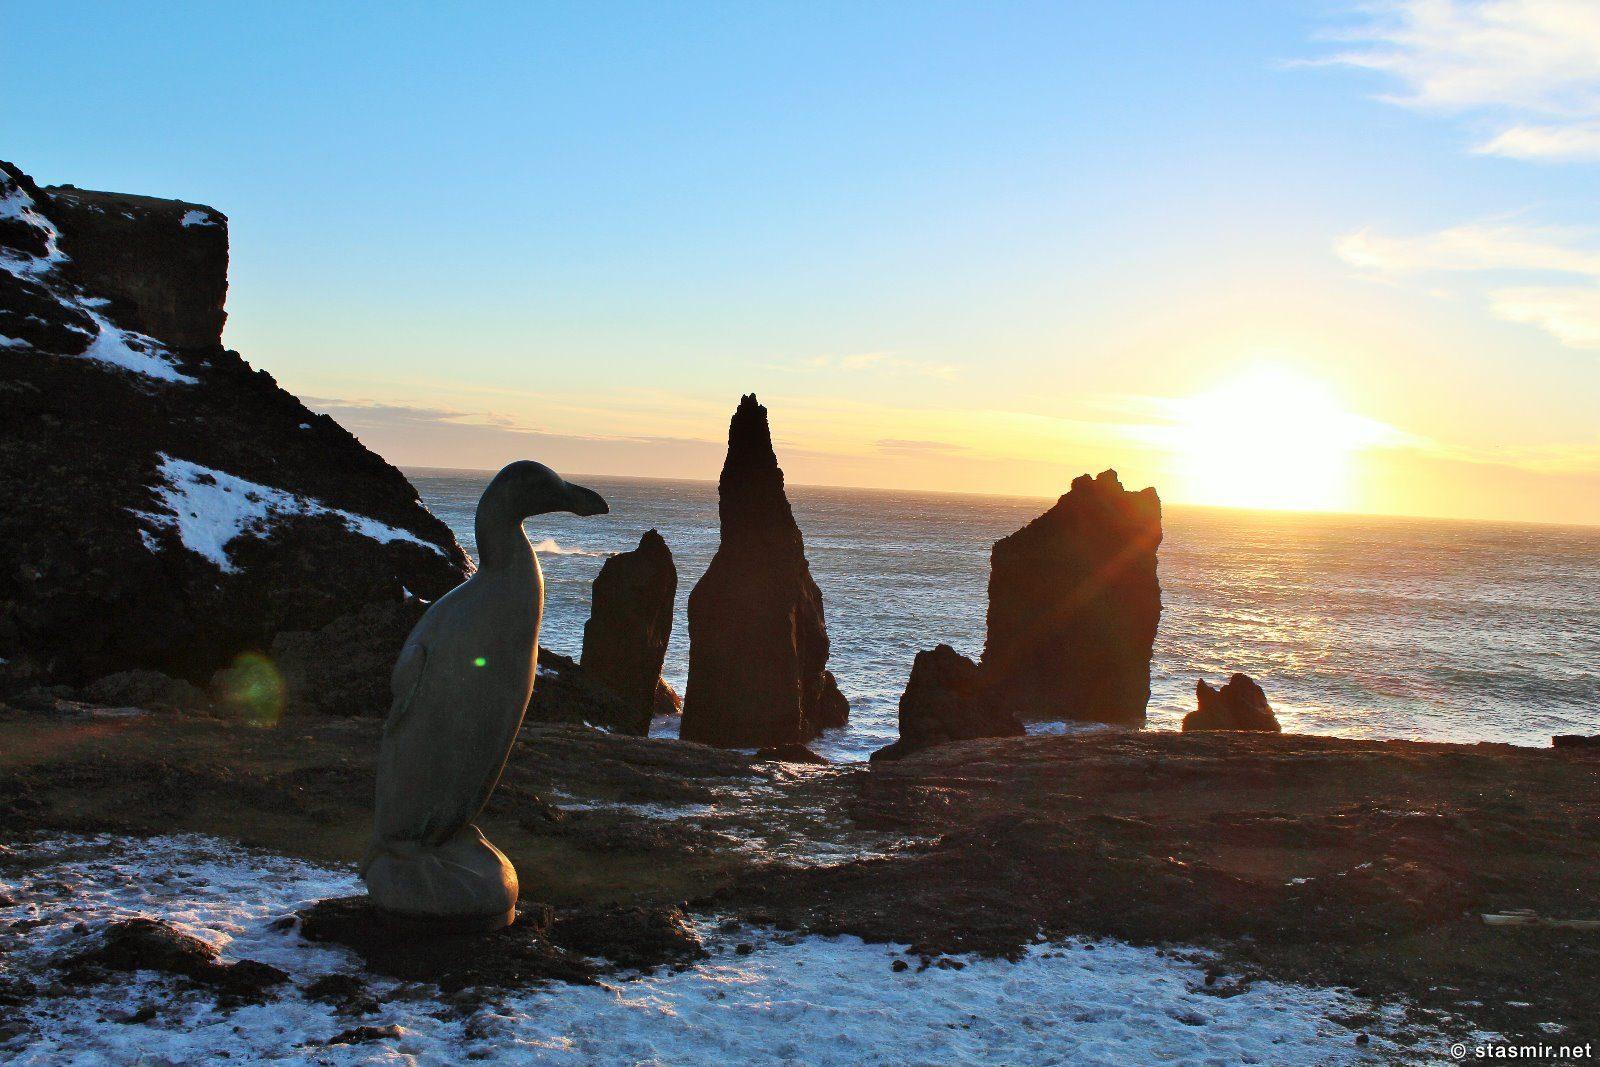 Бескрылая гагарка на закате, Reykjanes, Valahnúkur, Полуостров Рейкьянес, Валахньюкюр, скульптор Тодд МакГрейн, фото Стамир, photo Stasmir